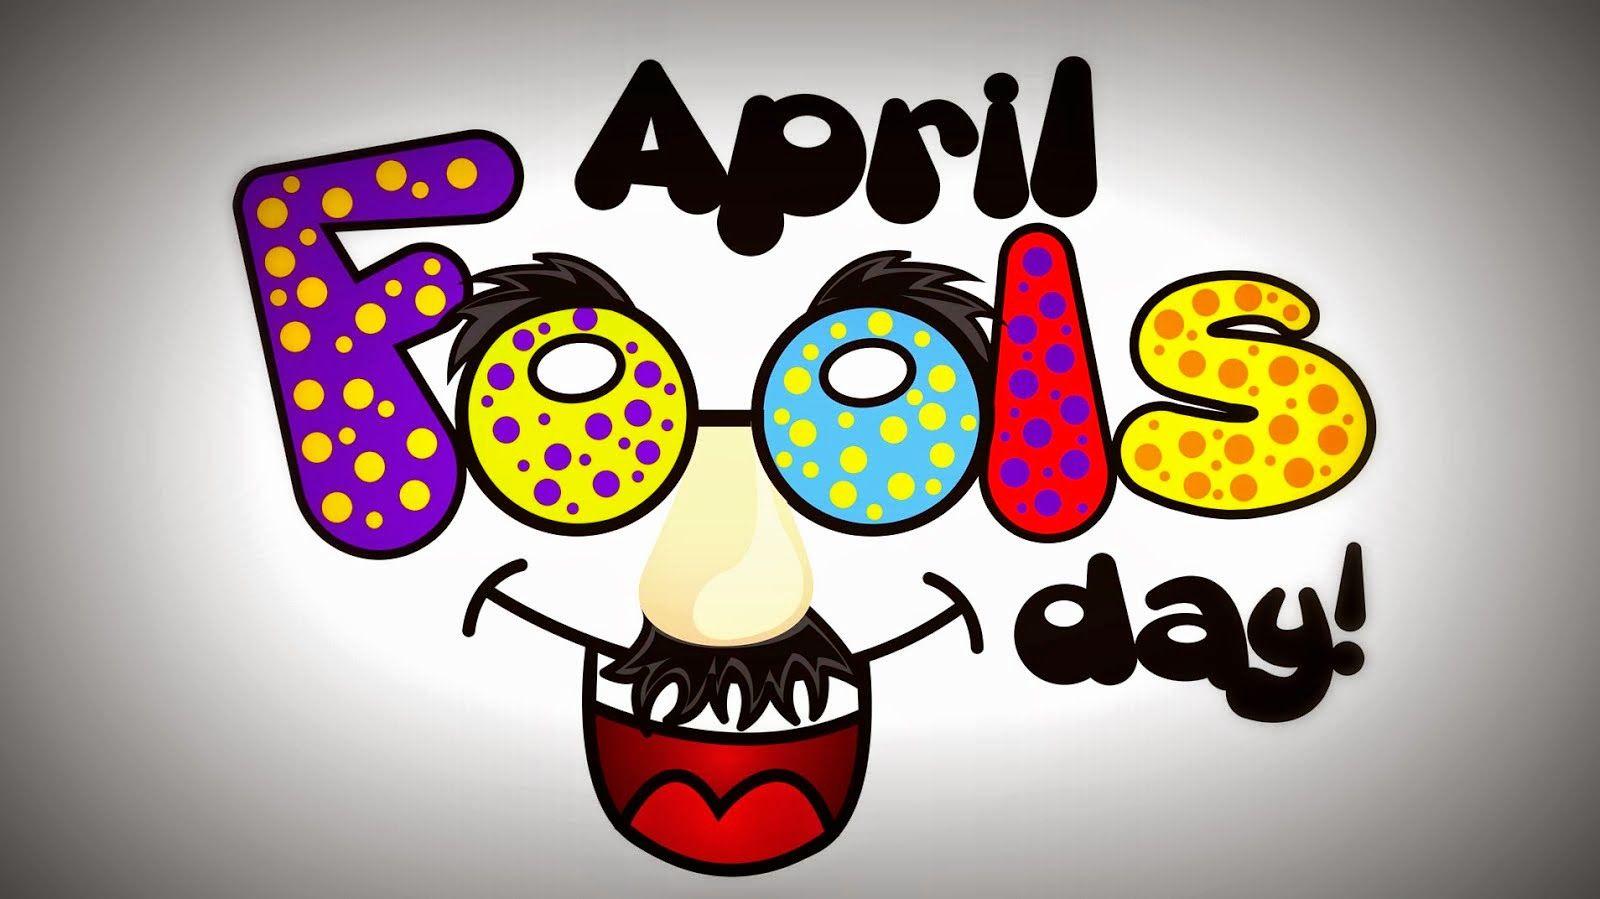 April Fool U002639 S Day Wallpapers Download Free High Definition Desktop Backgrounds April Fools Day Origin April Fools April Fool S Day